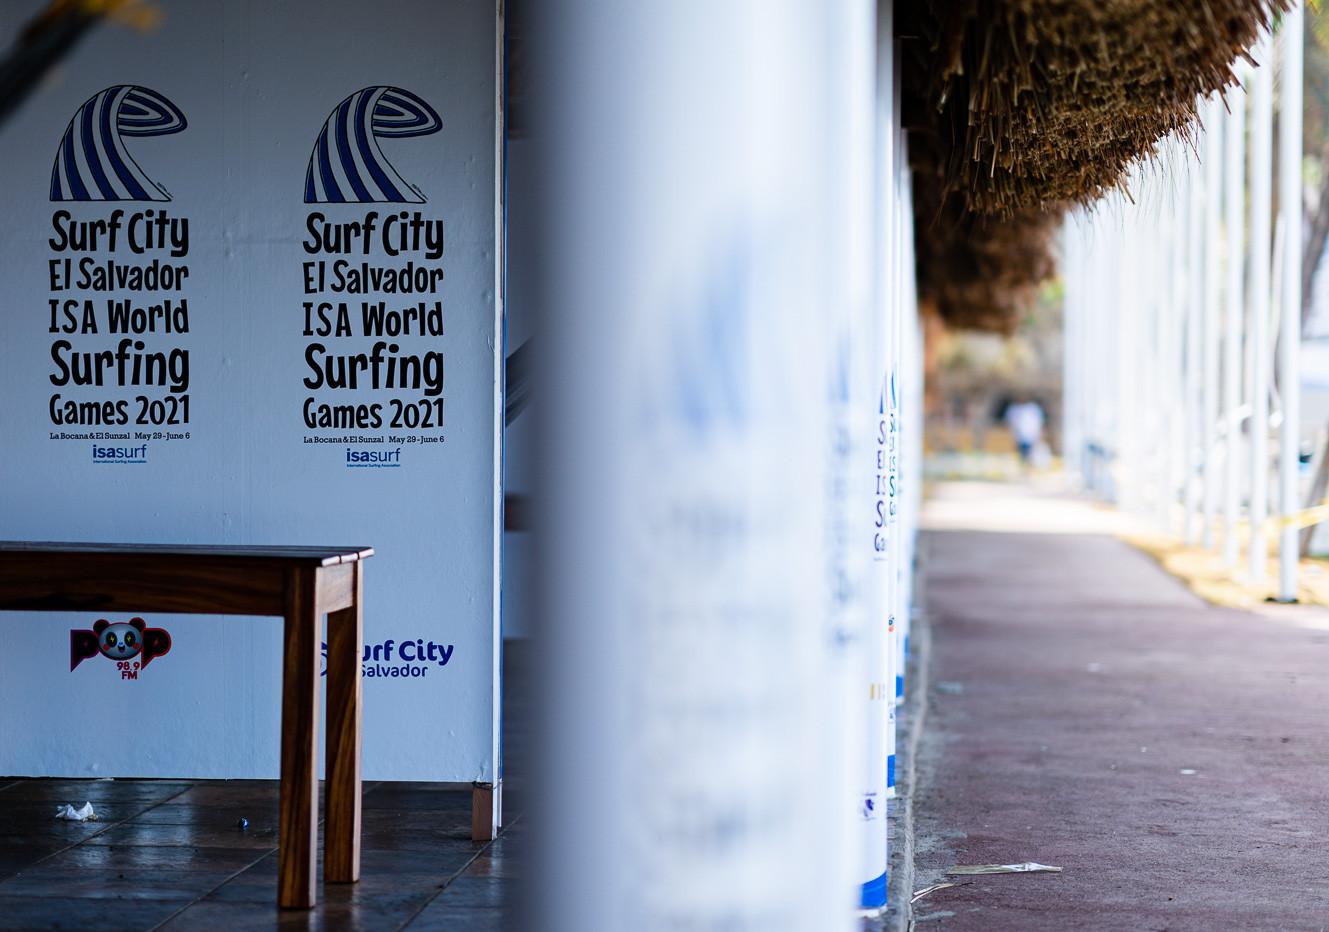 ISA confirms 18 positive COVID-19 cases ahead of World Surfing Games in El Salvador